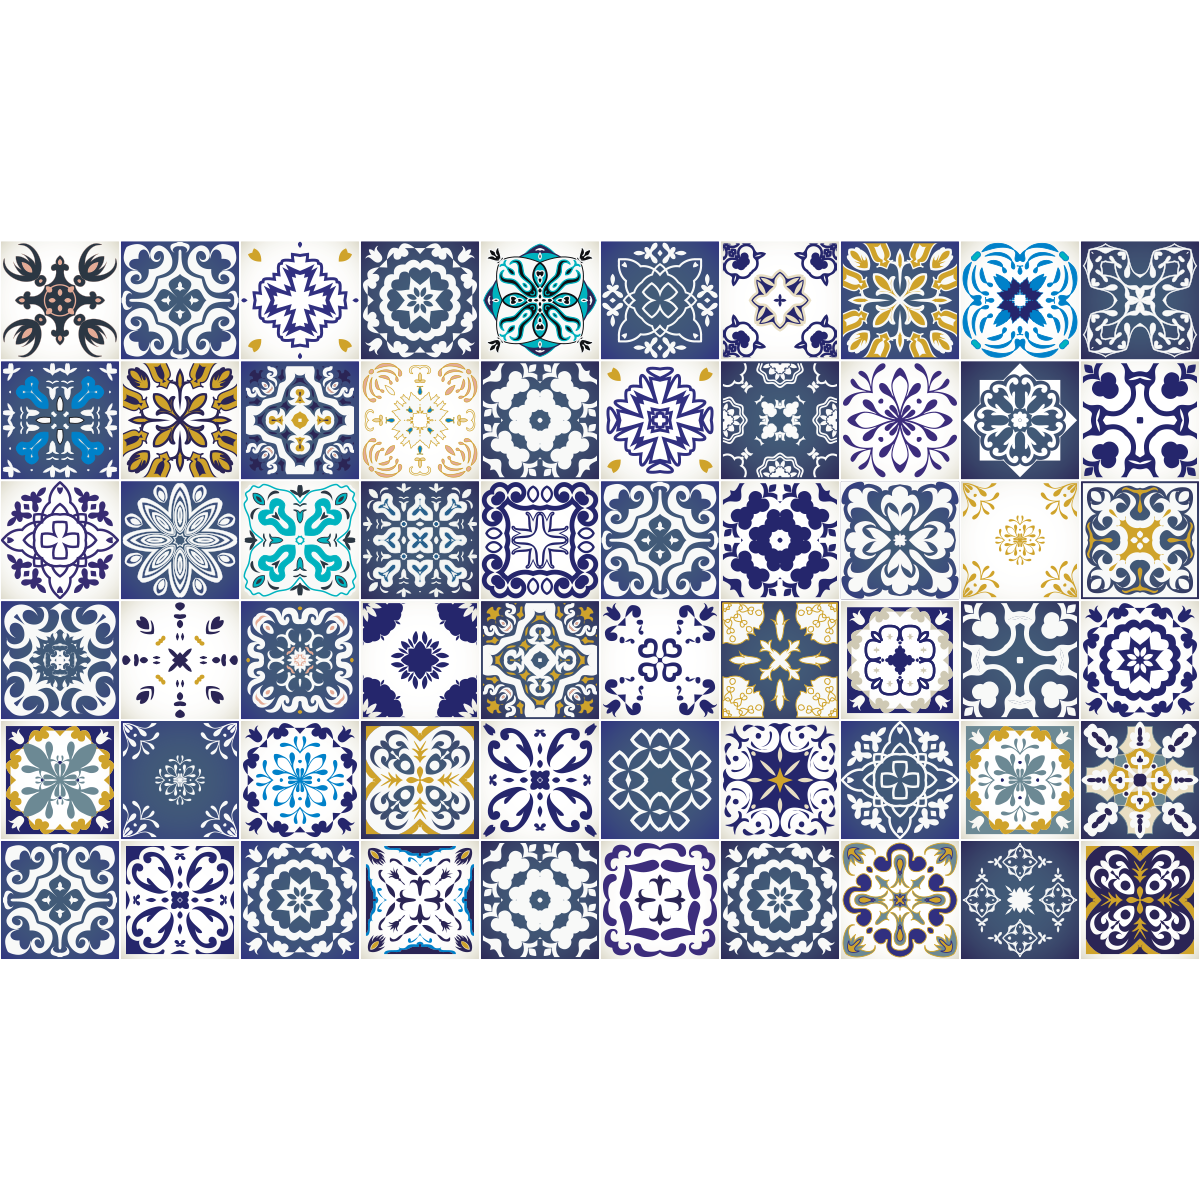 Accessoires Salle De Bain Azulejos ~ 60 stickers carrelages azulejos cyprus salle de bain et wc salle